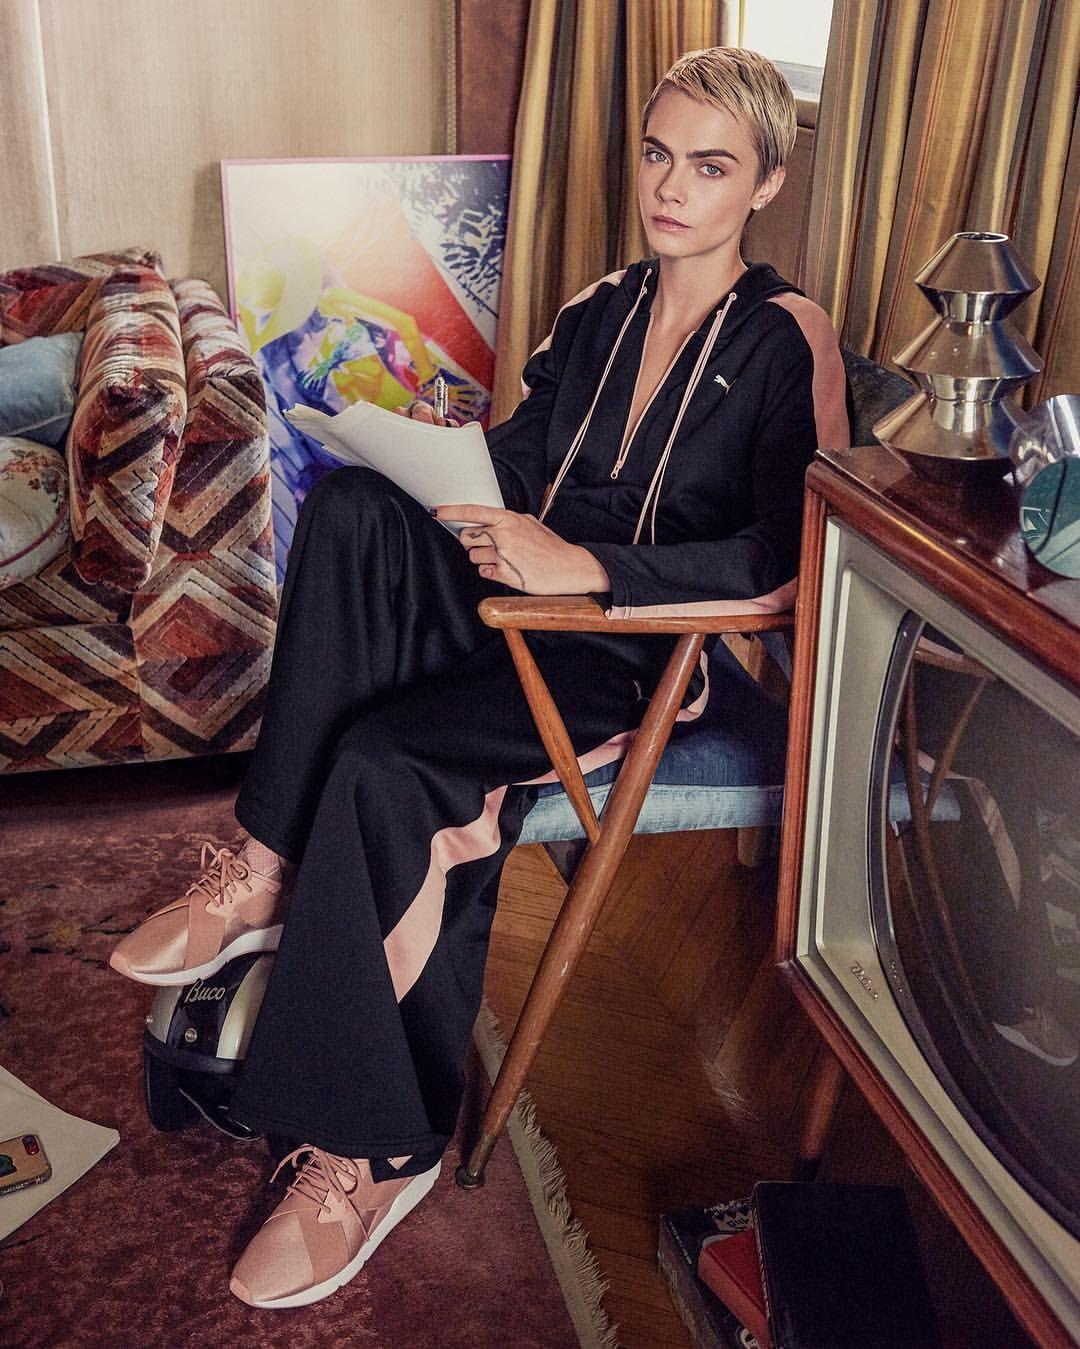 ce14f9be7fd Cara Delevingne for Puma 2018 Pinterest  jcolemadison